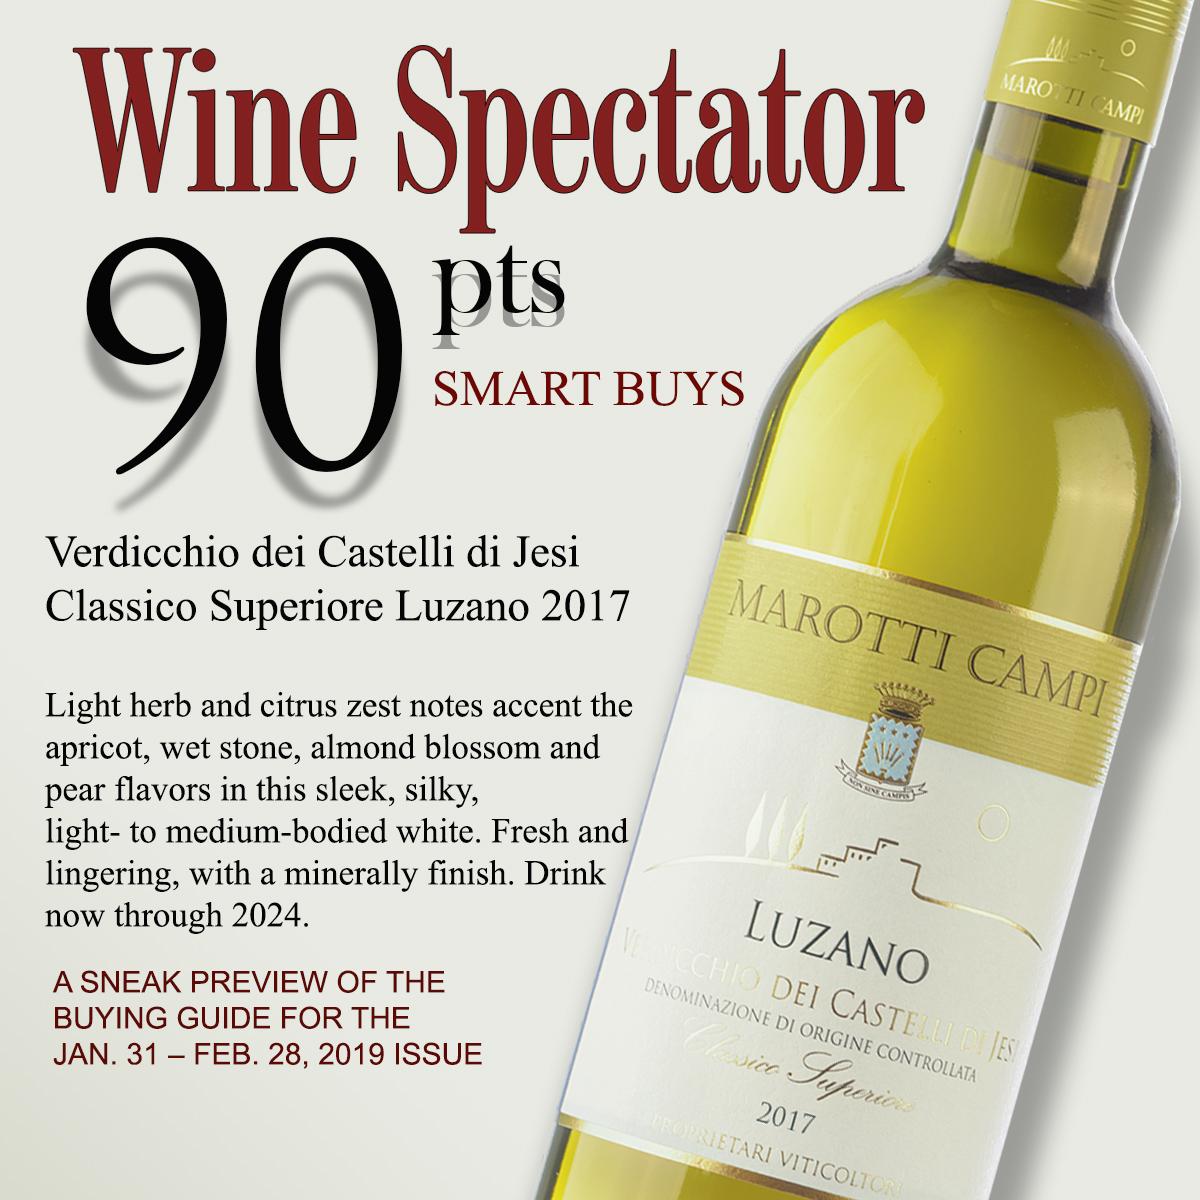 WINE-SPECTATOR-Luzano-2017-90-Points.jpg